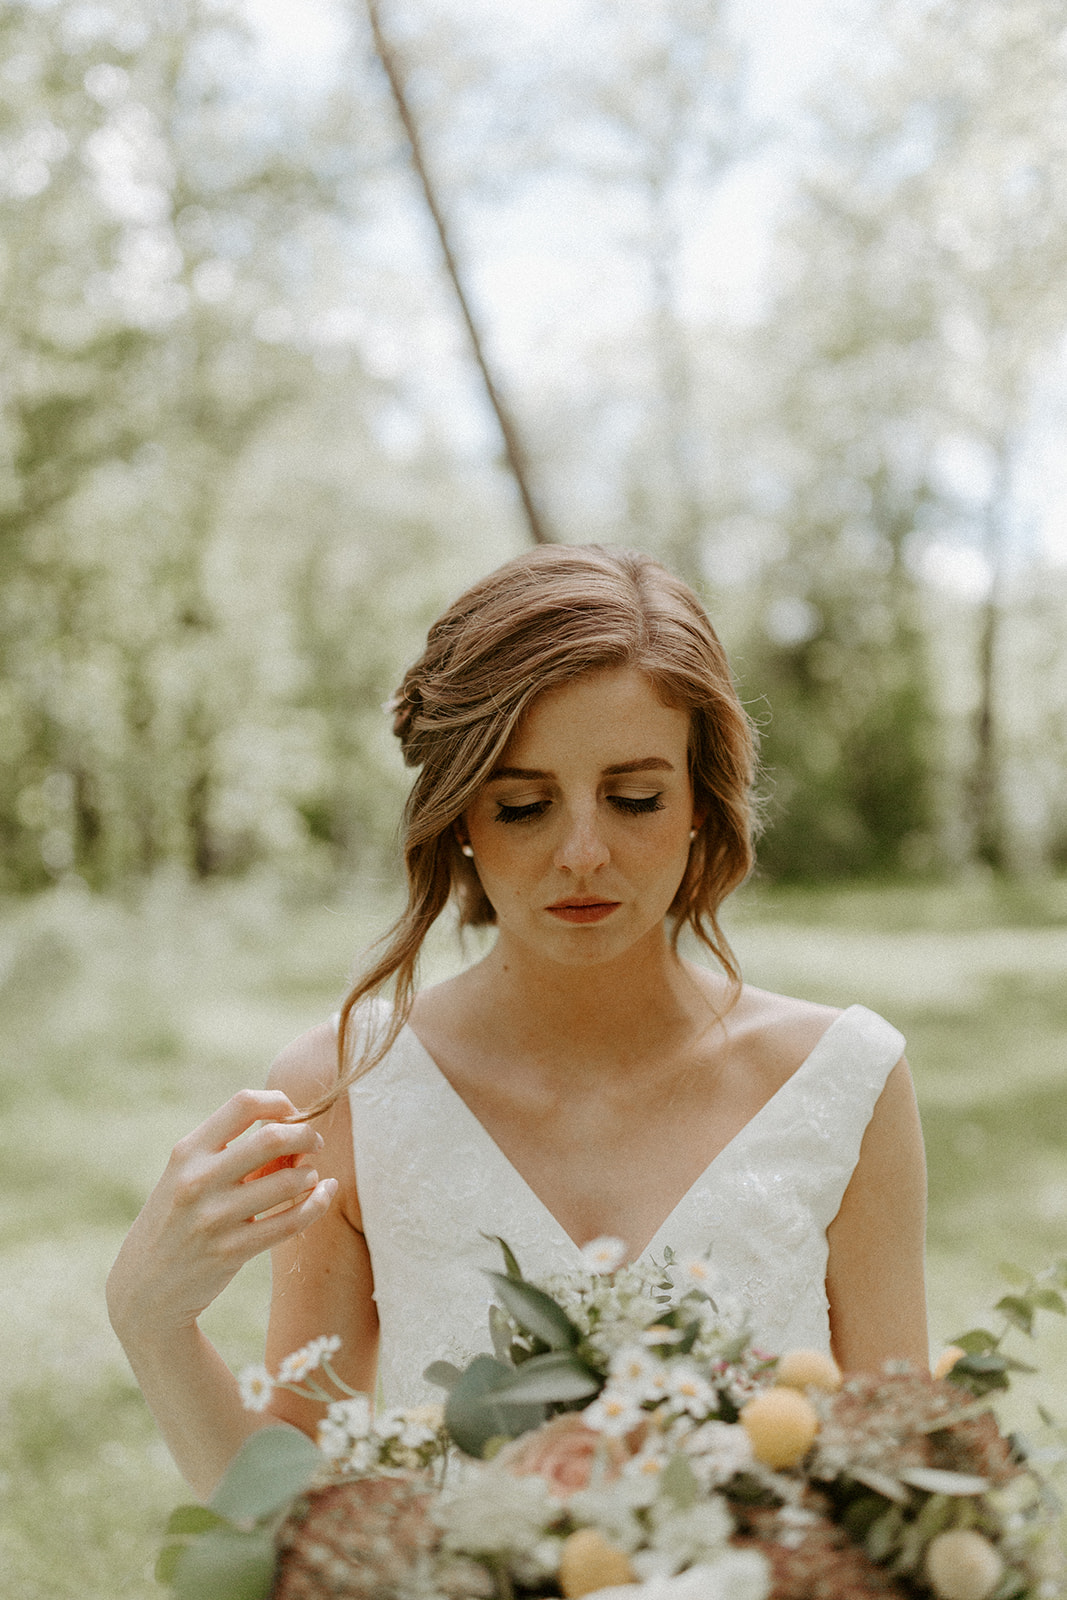 camp_wokanda_peoria_illinois_wedding_photographer_wright_photographs_bliese_0650.jpg